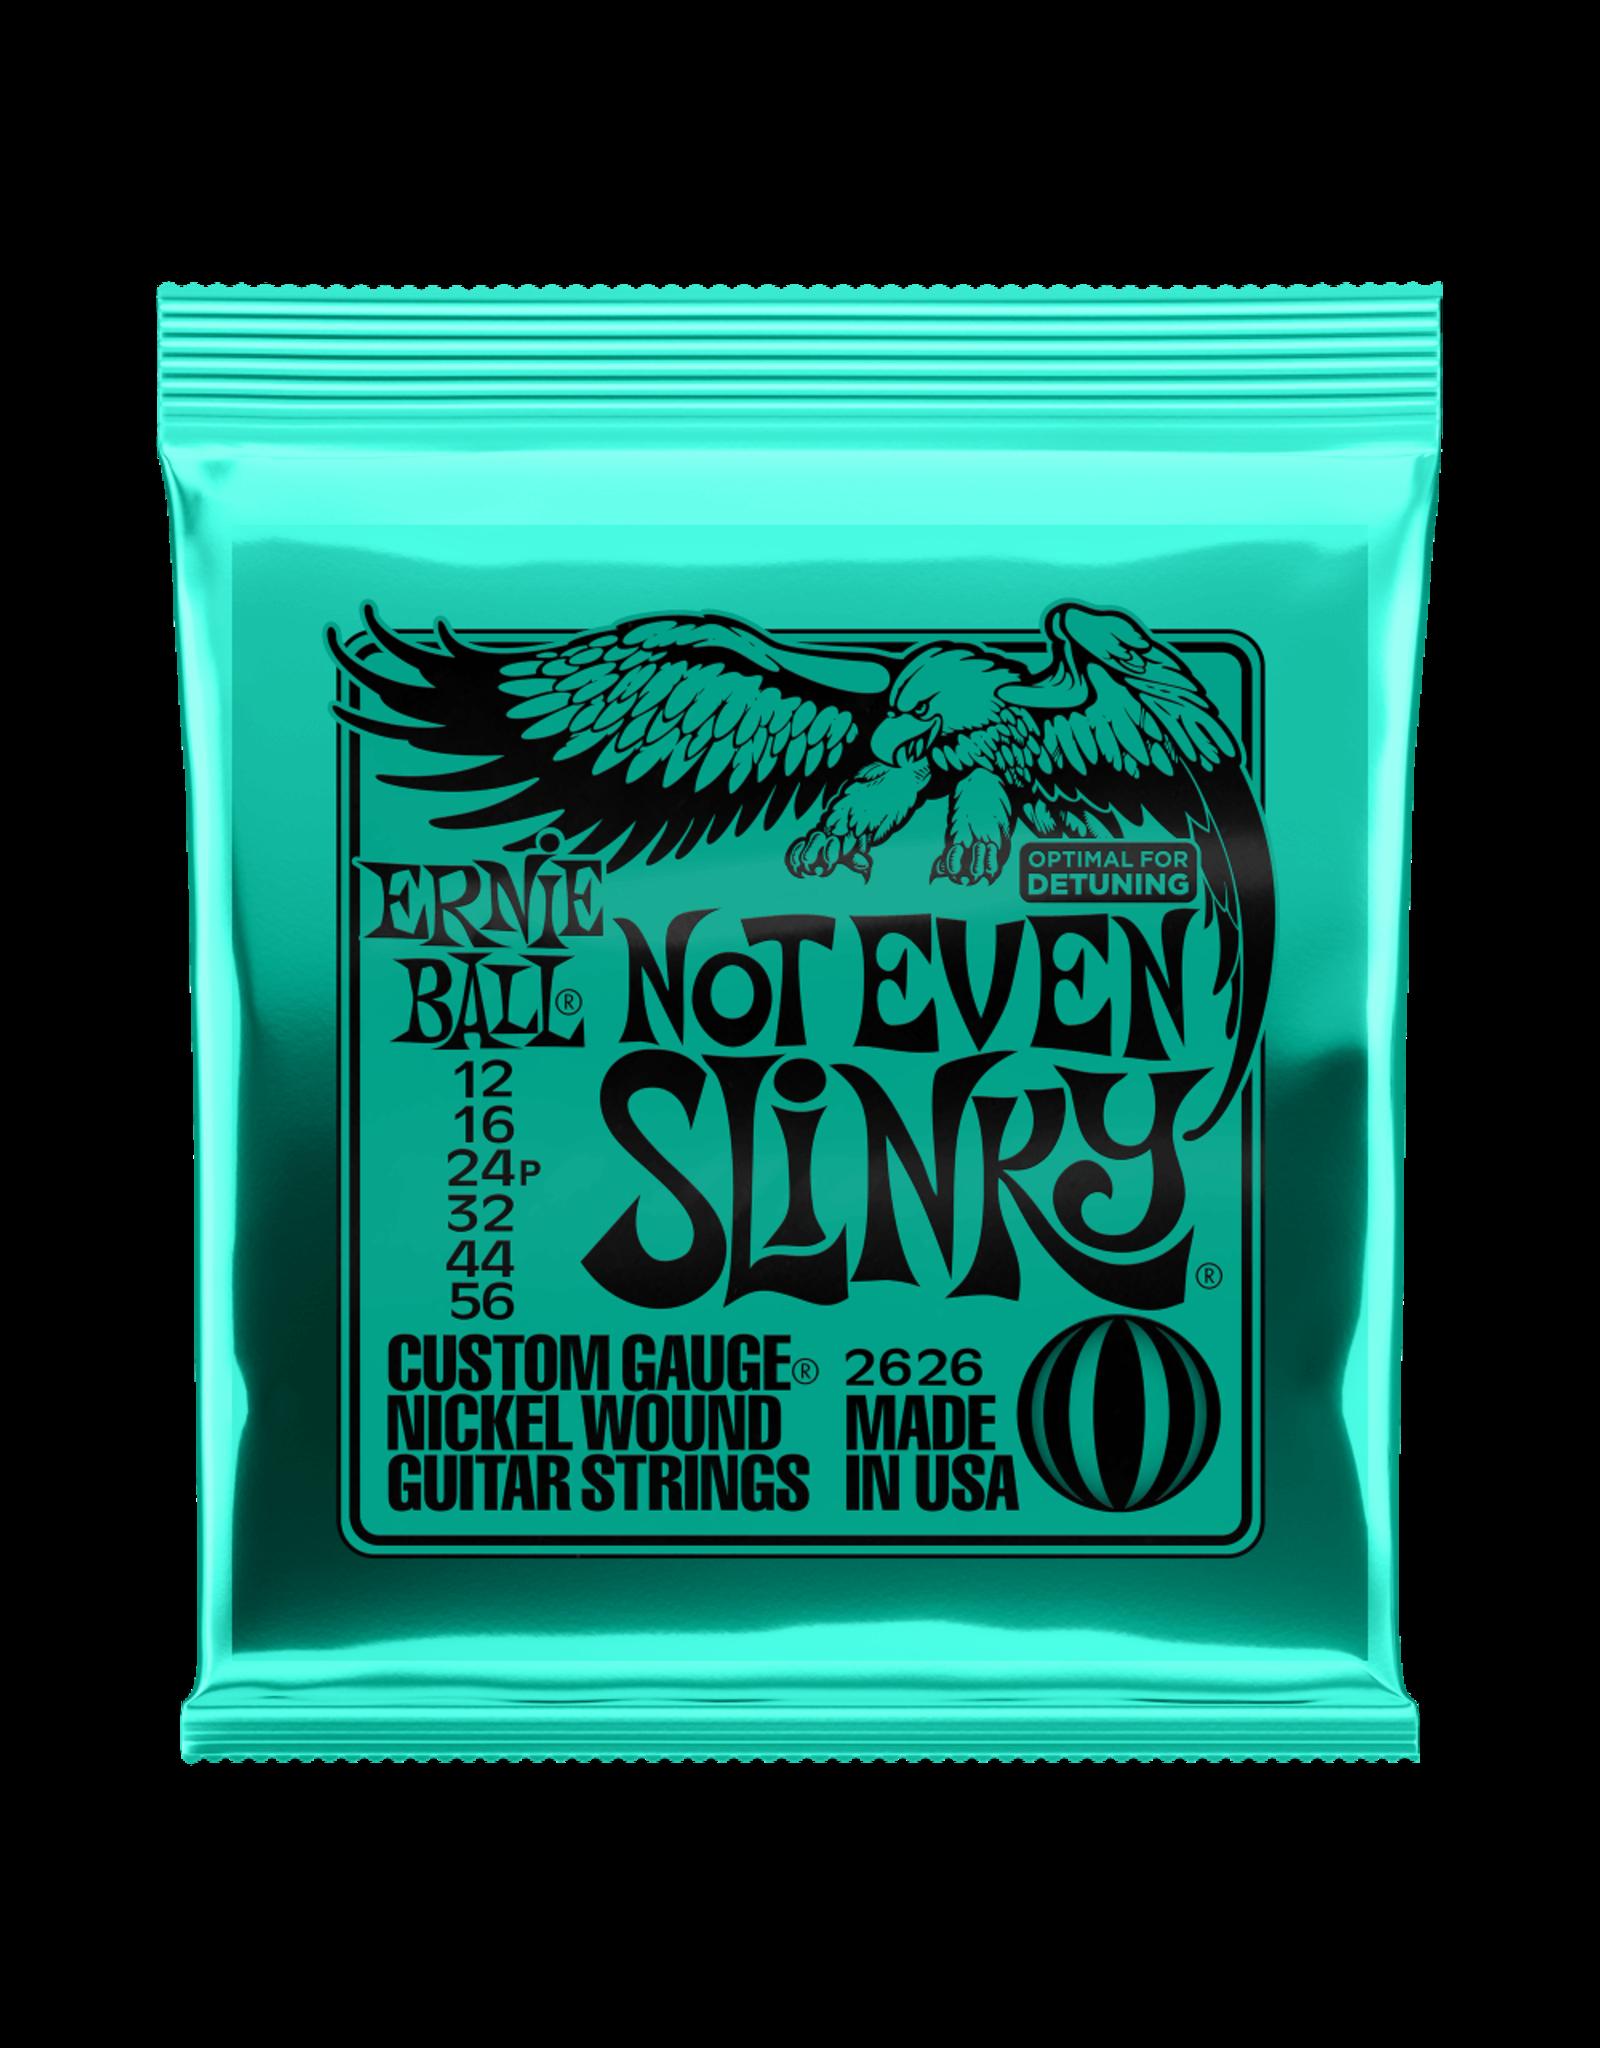 Ernie Ball Ernie Ball 2626 Not Even Slinky Nickel Wound Electric Guitar Strings 12-56 Gauge